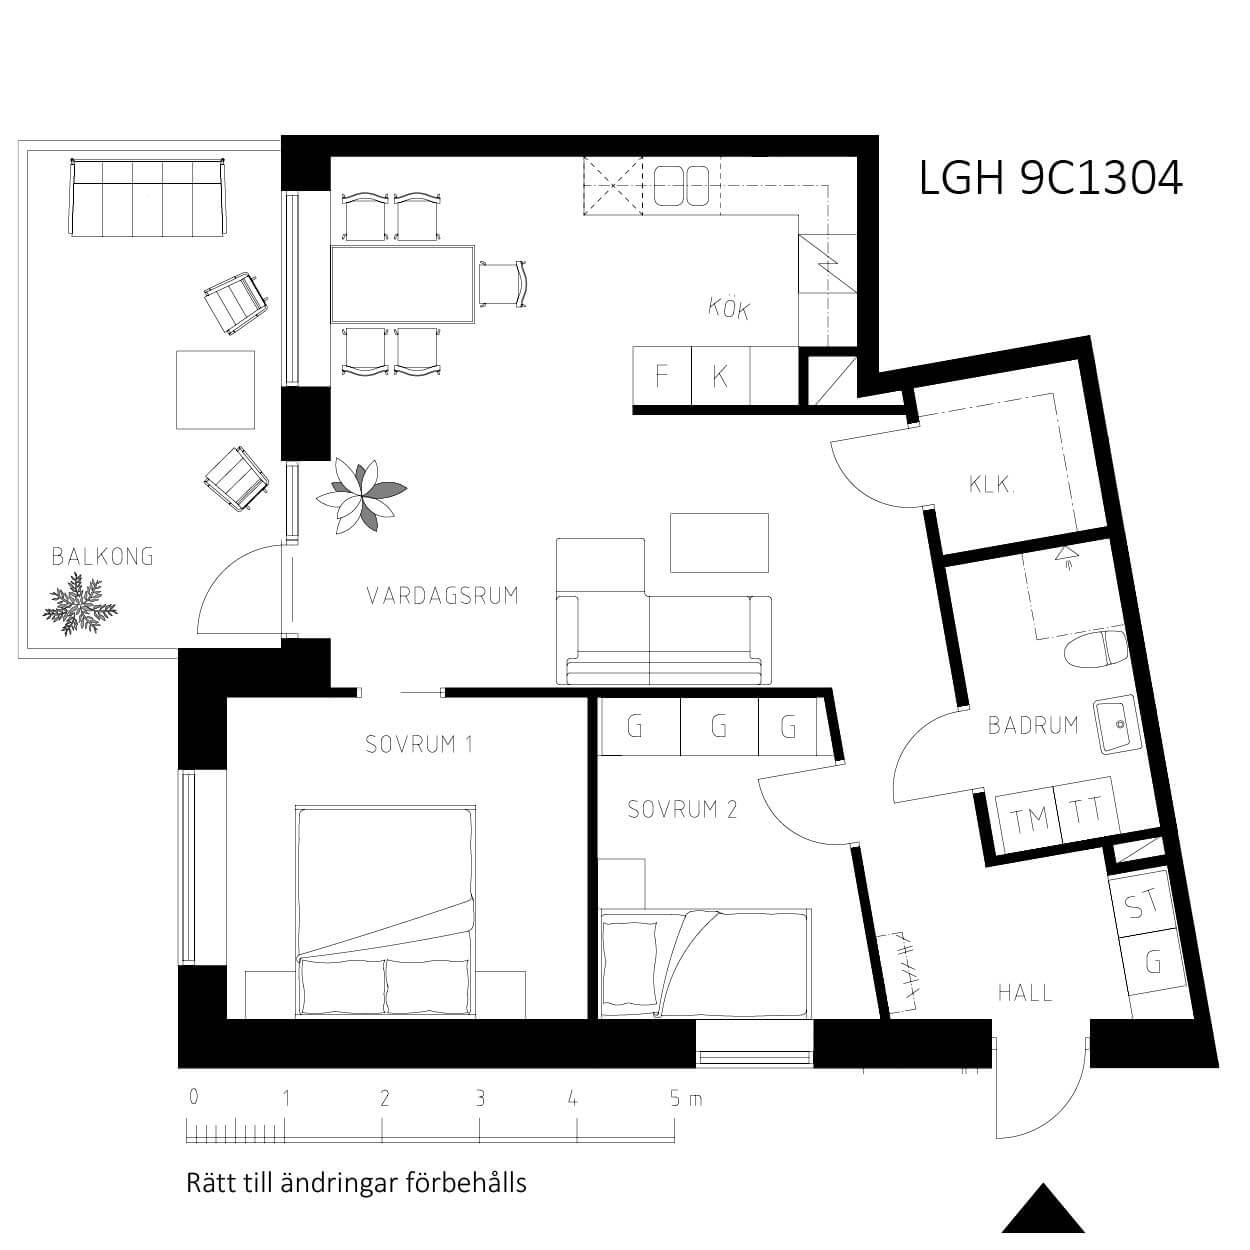 lgh_9C1304